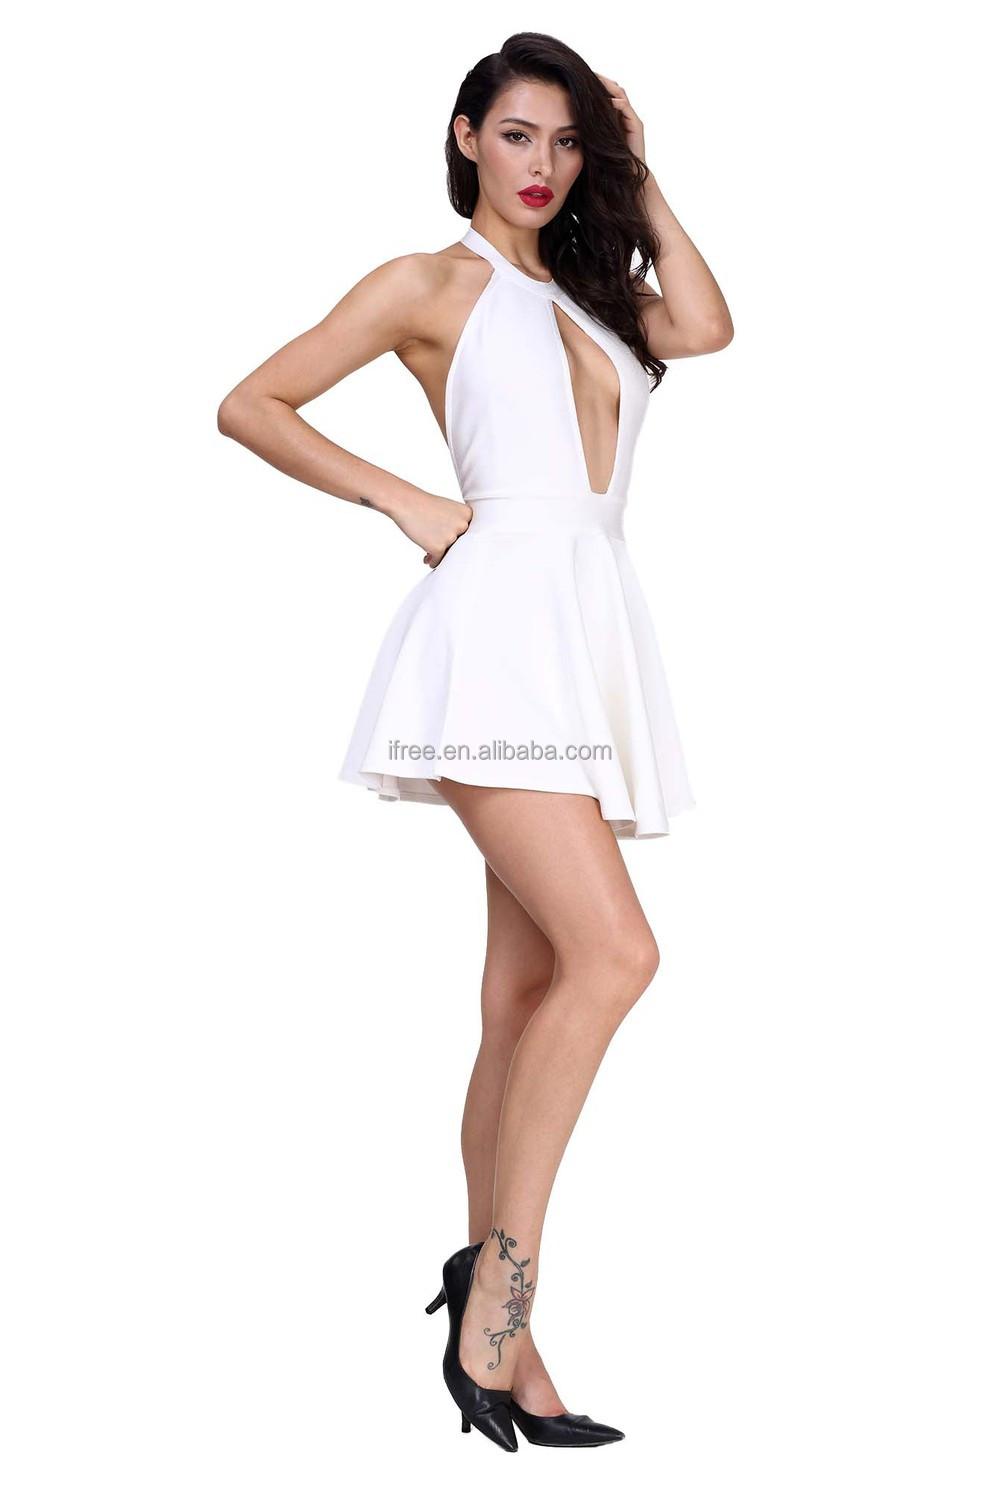 Sexy girls in mini dress